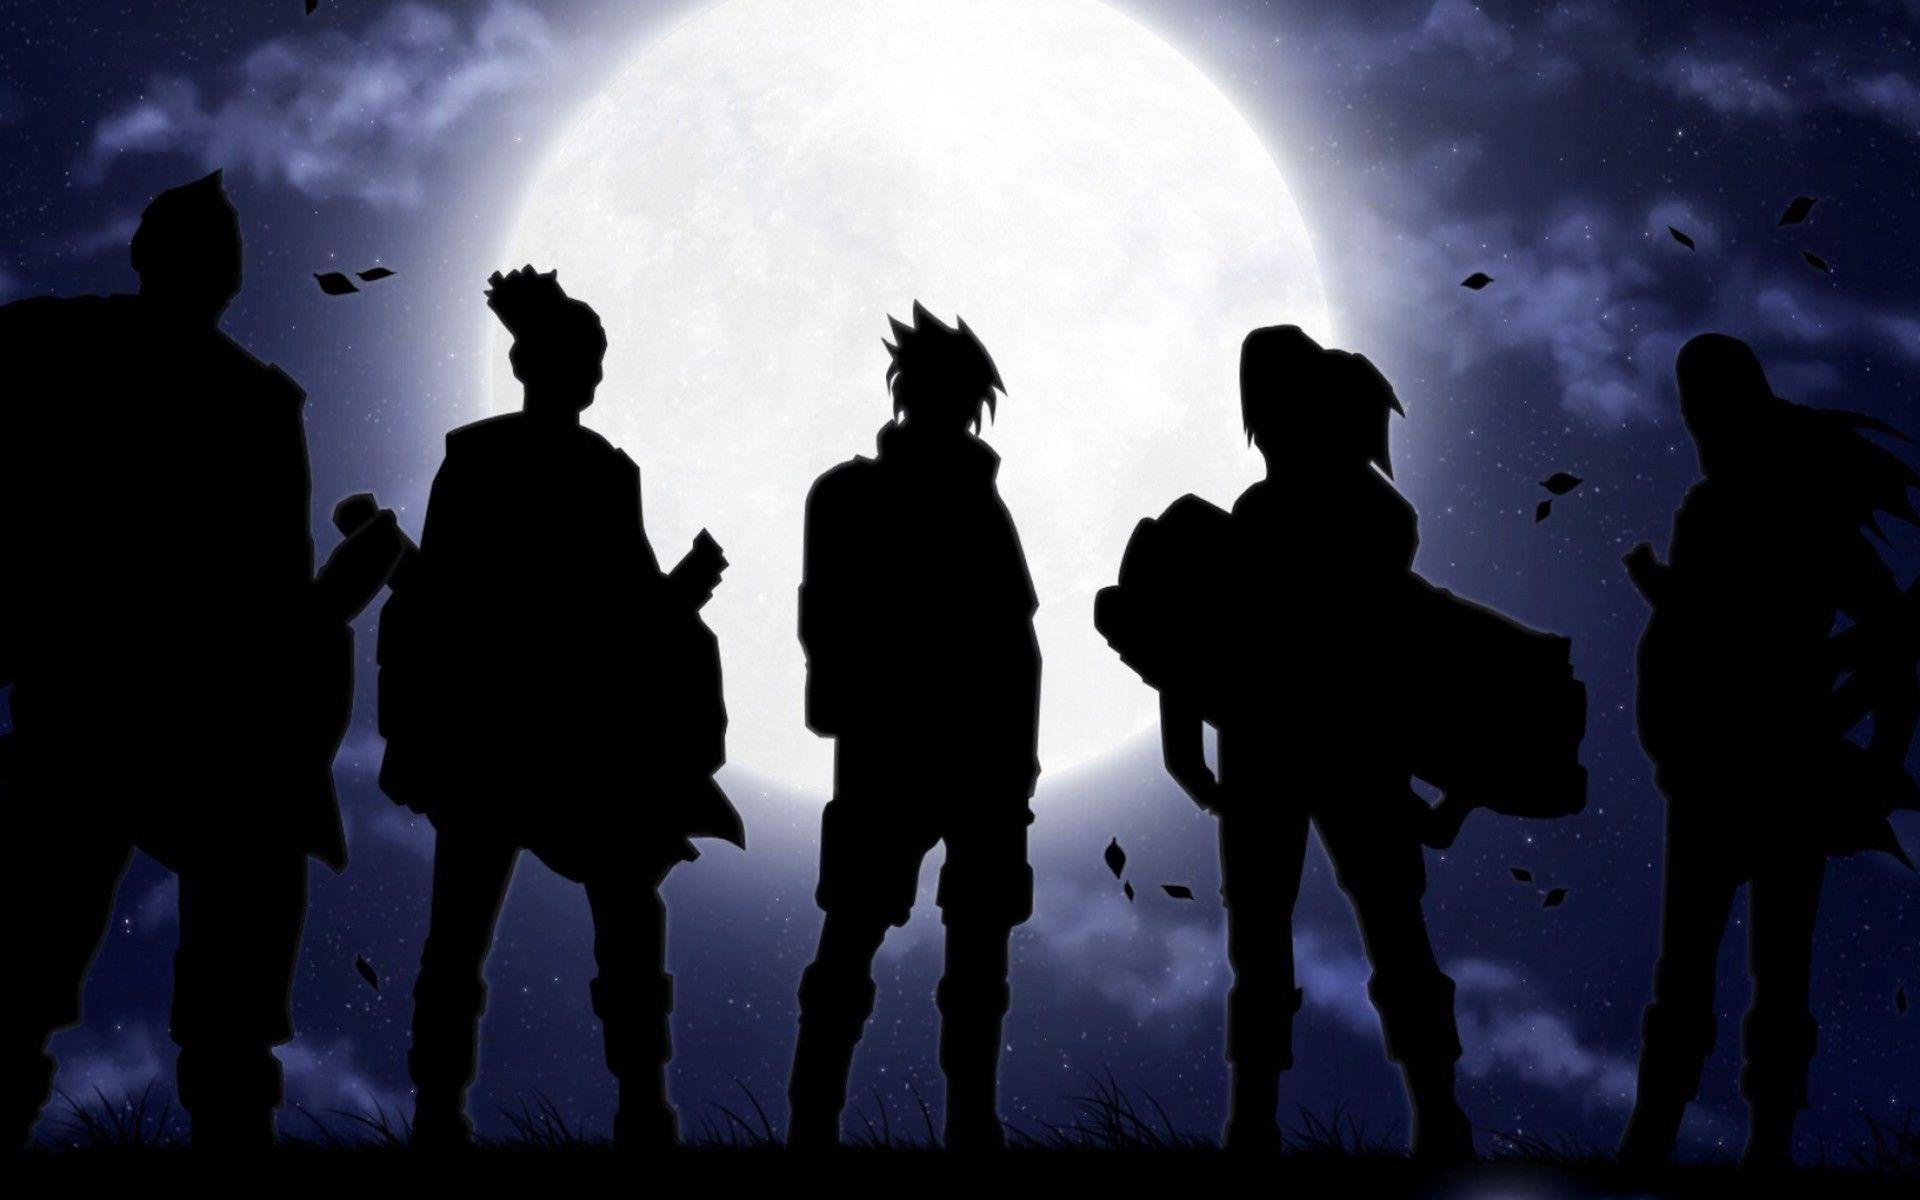 anime desktop backgrounds hd - sf wallpaper